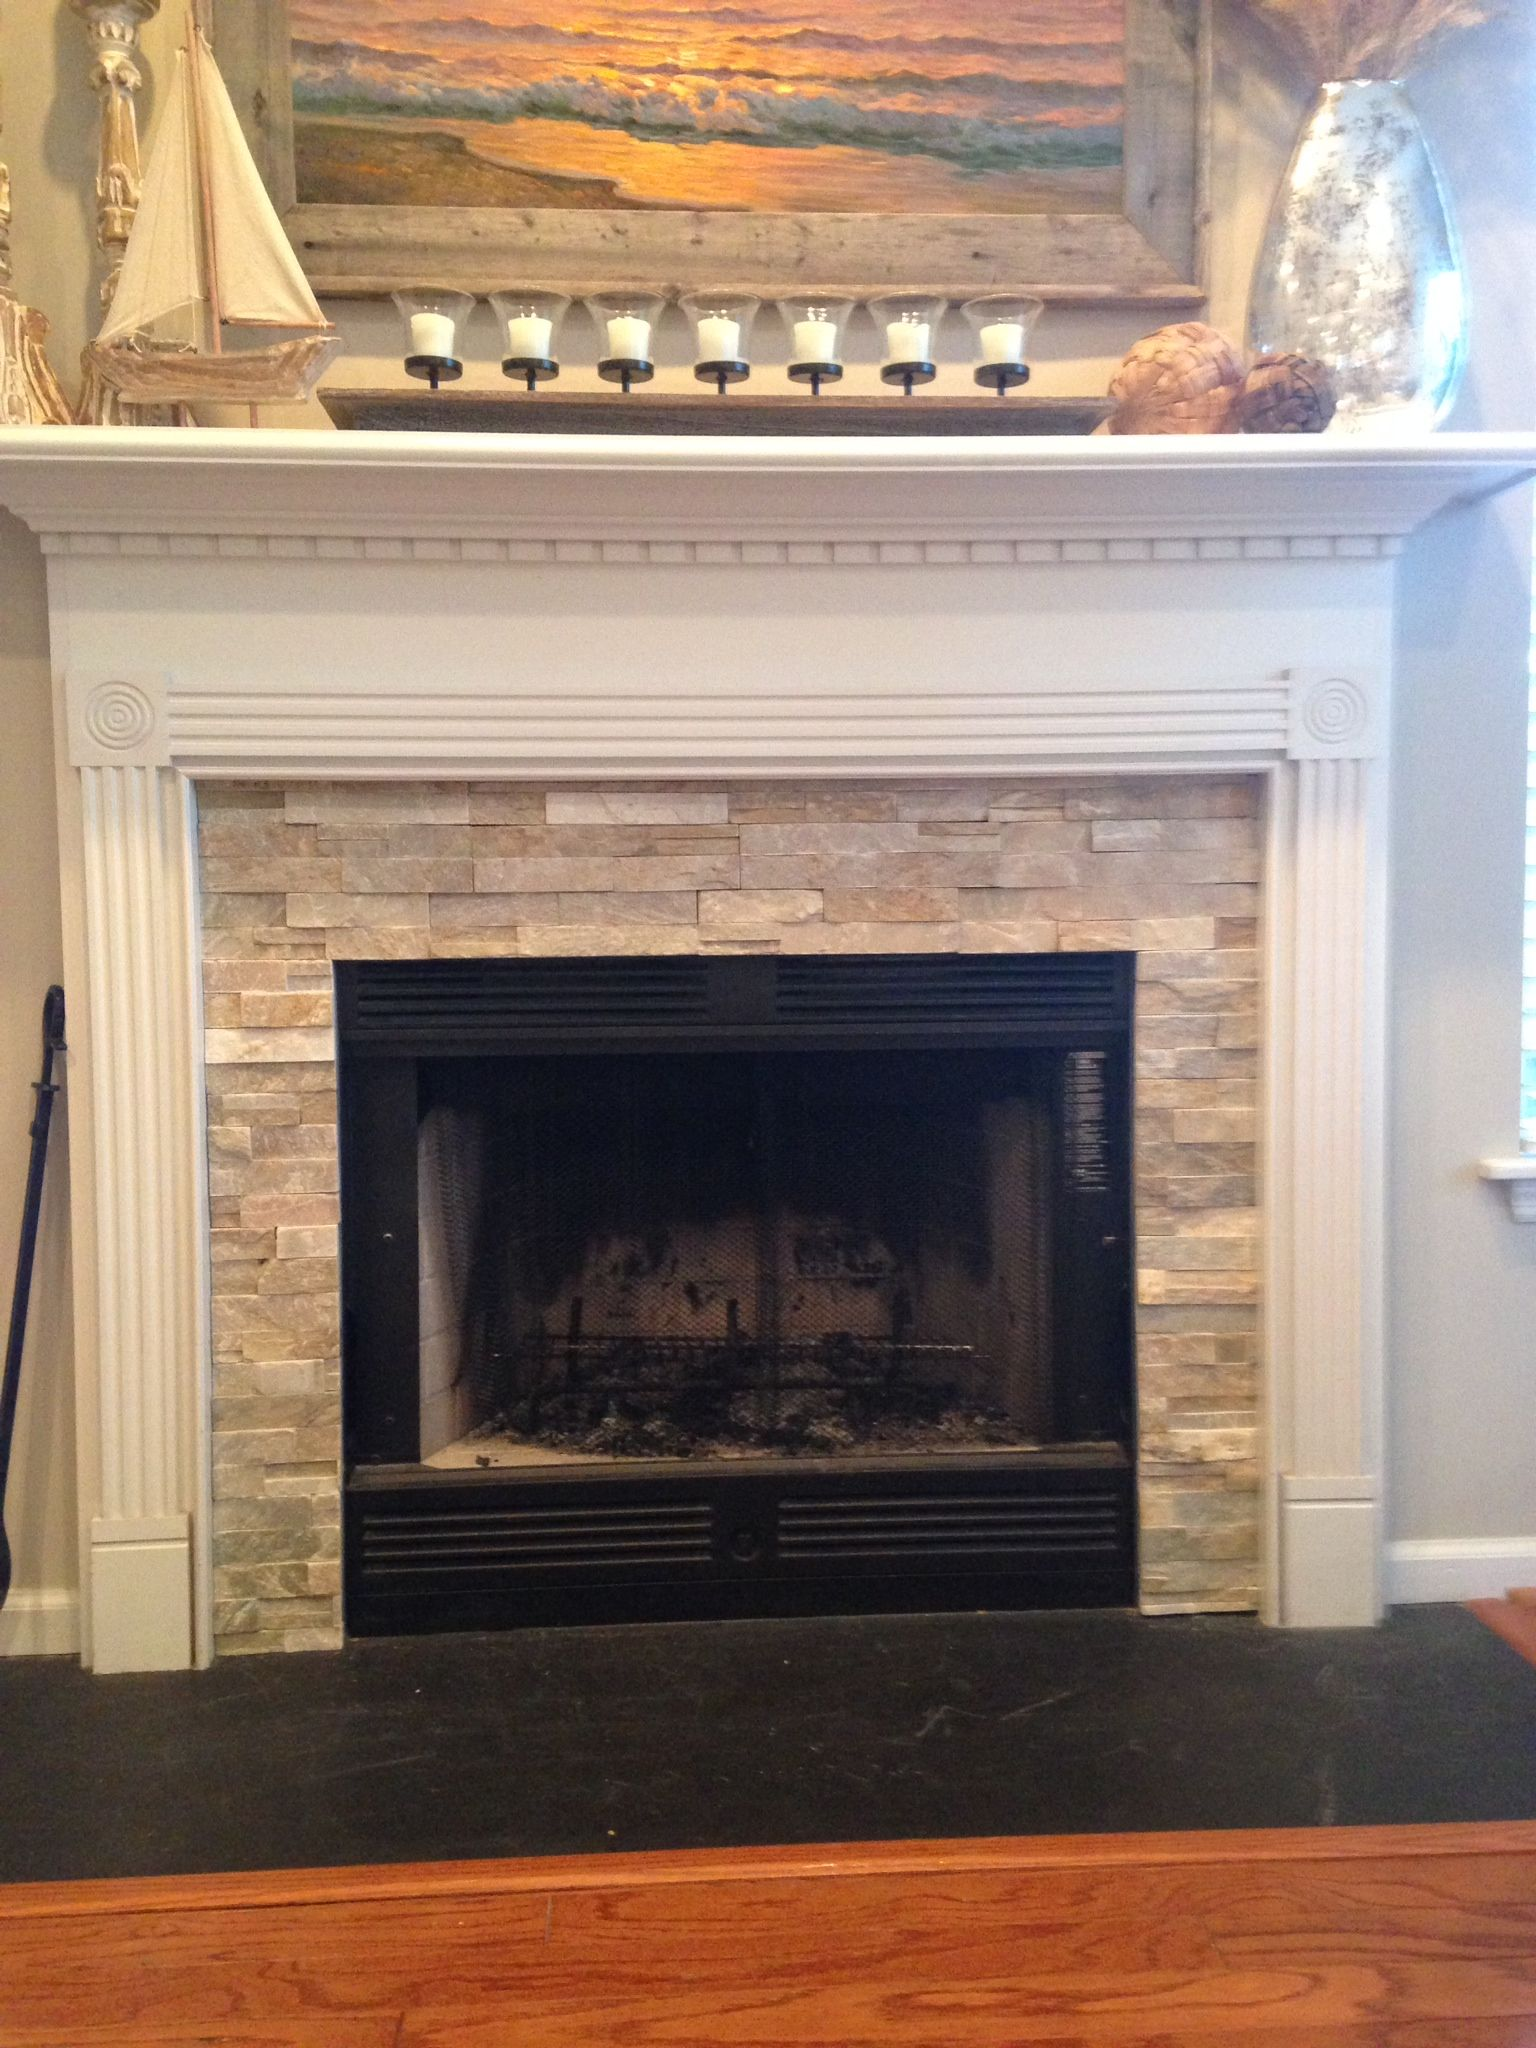 Fireplace Hearth Paint Beautiful Fireplace Idea Mantel Wainscoting Design Craftsman